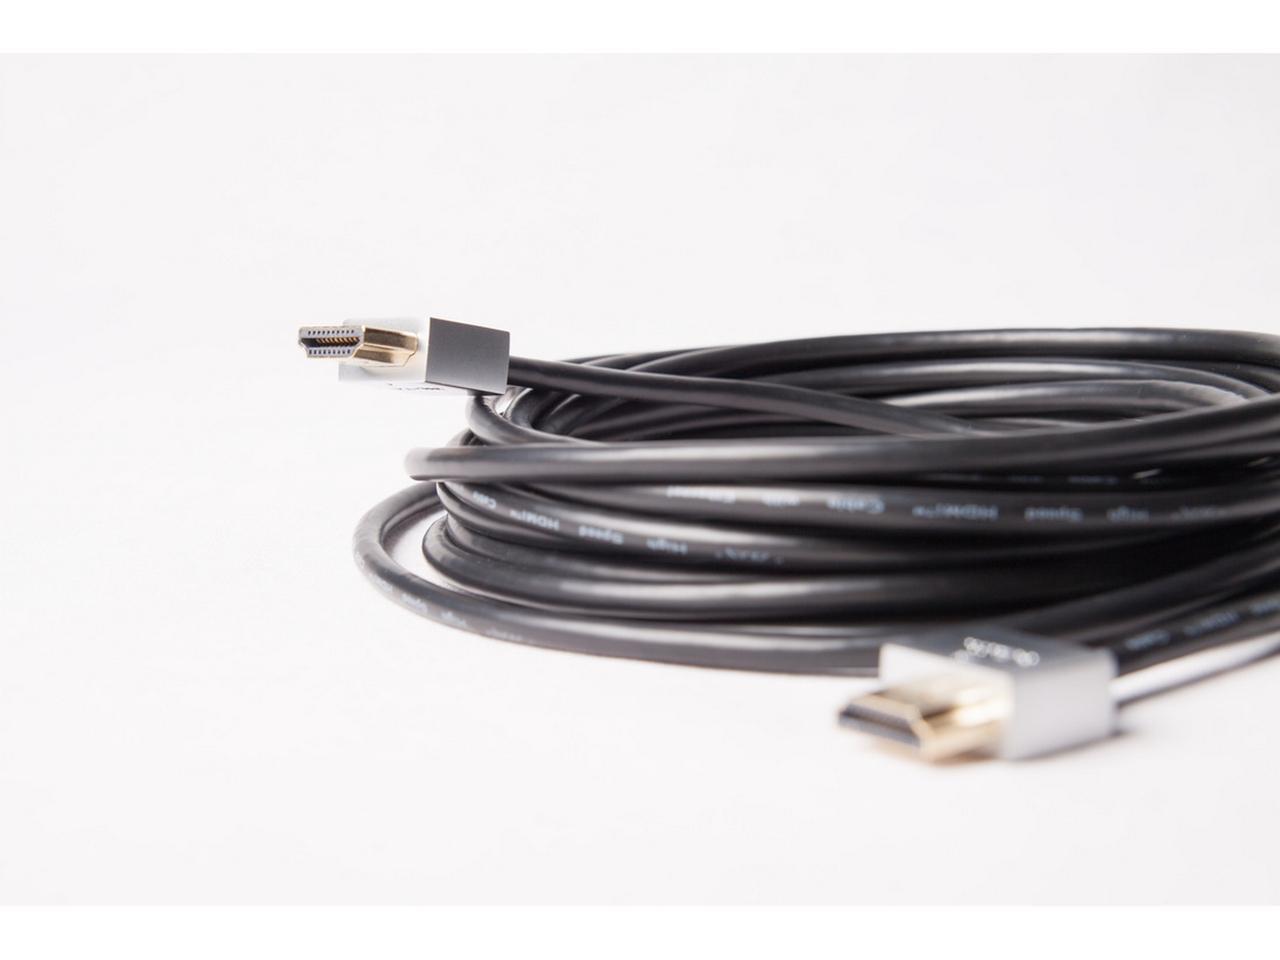 ZHSC-3.0M 4K High Speed Round HDMI Cable - 3.0m by Zigen